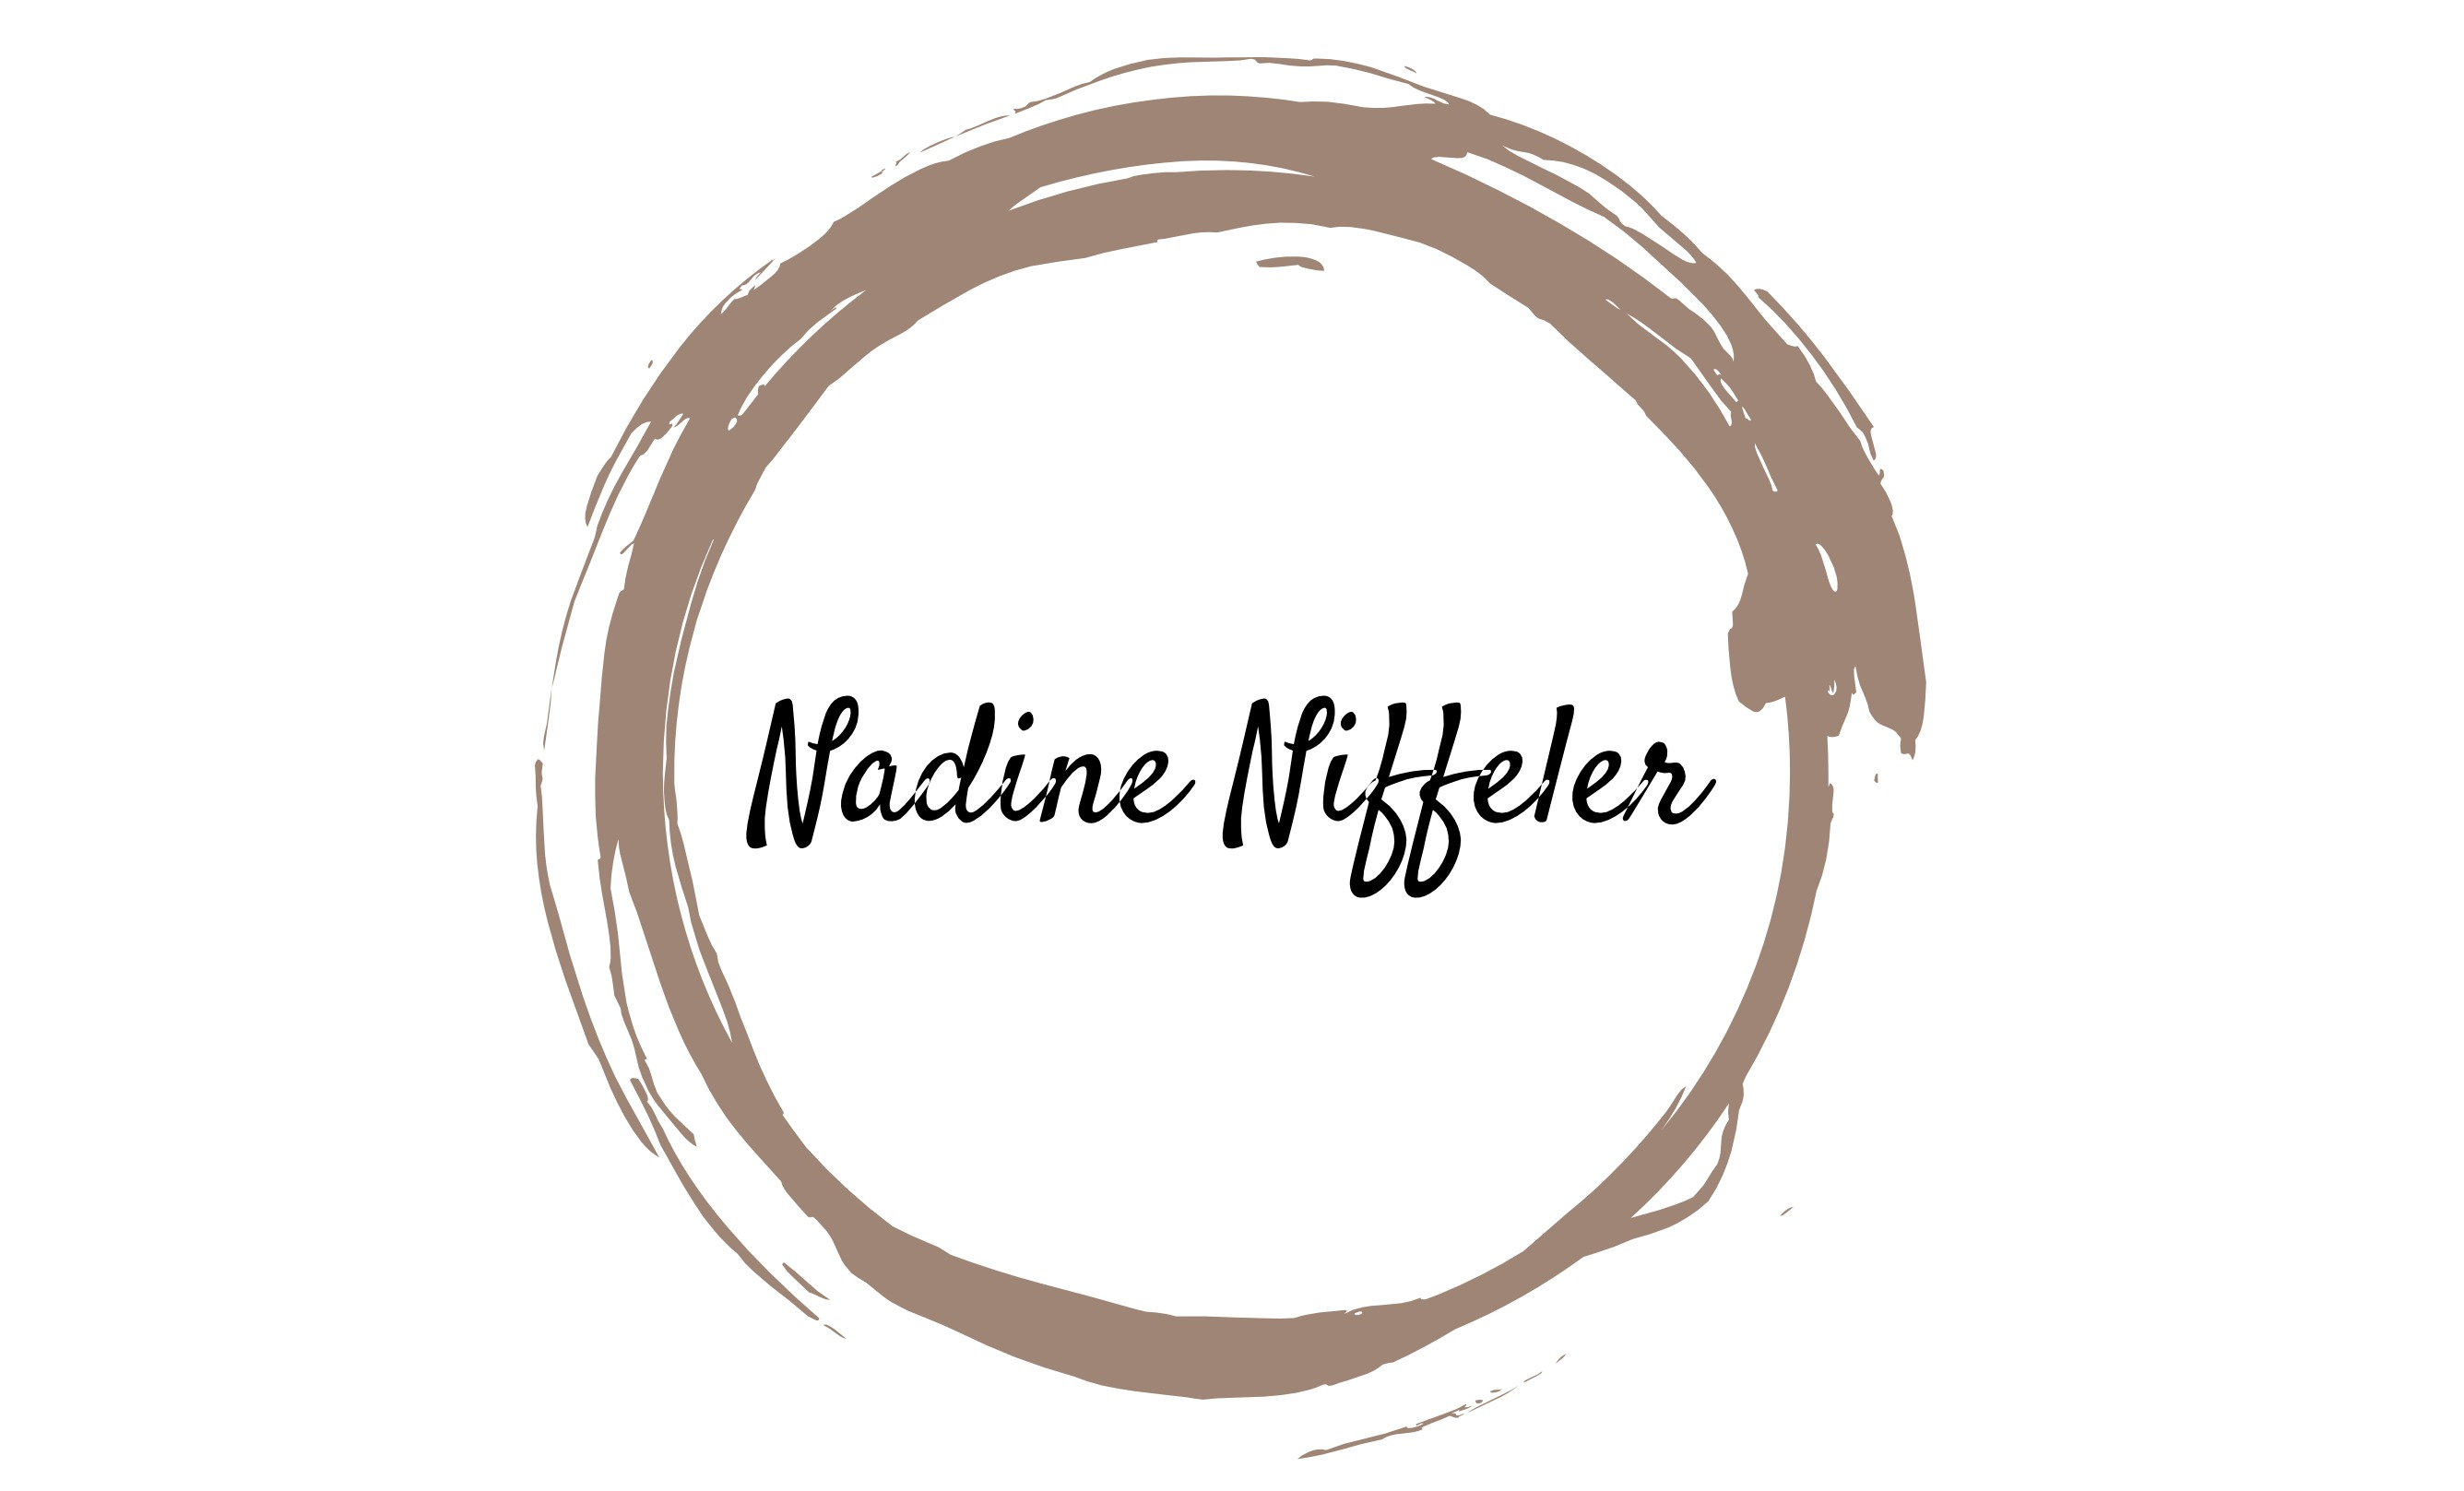 Nadine Niffeler